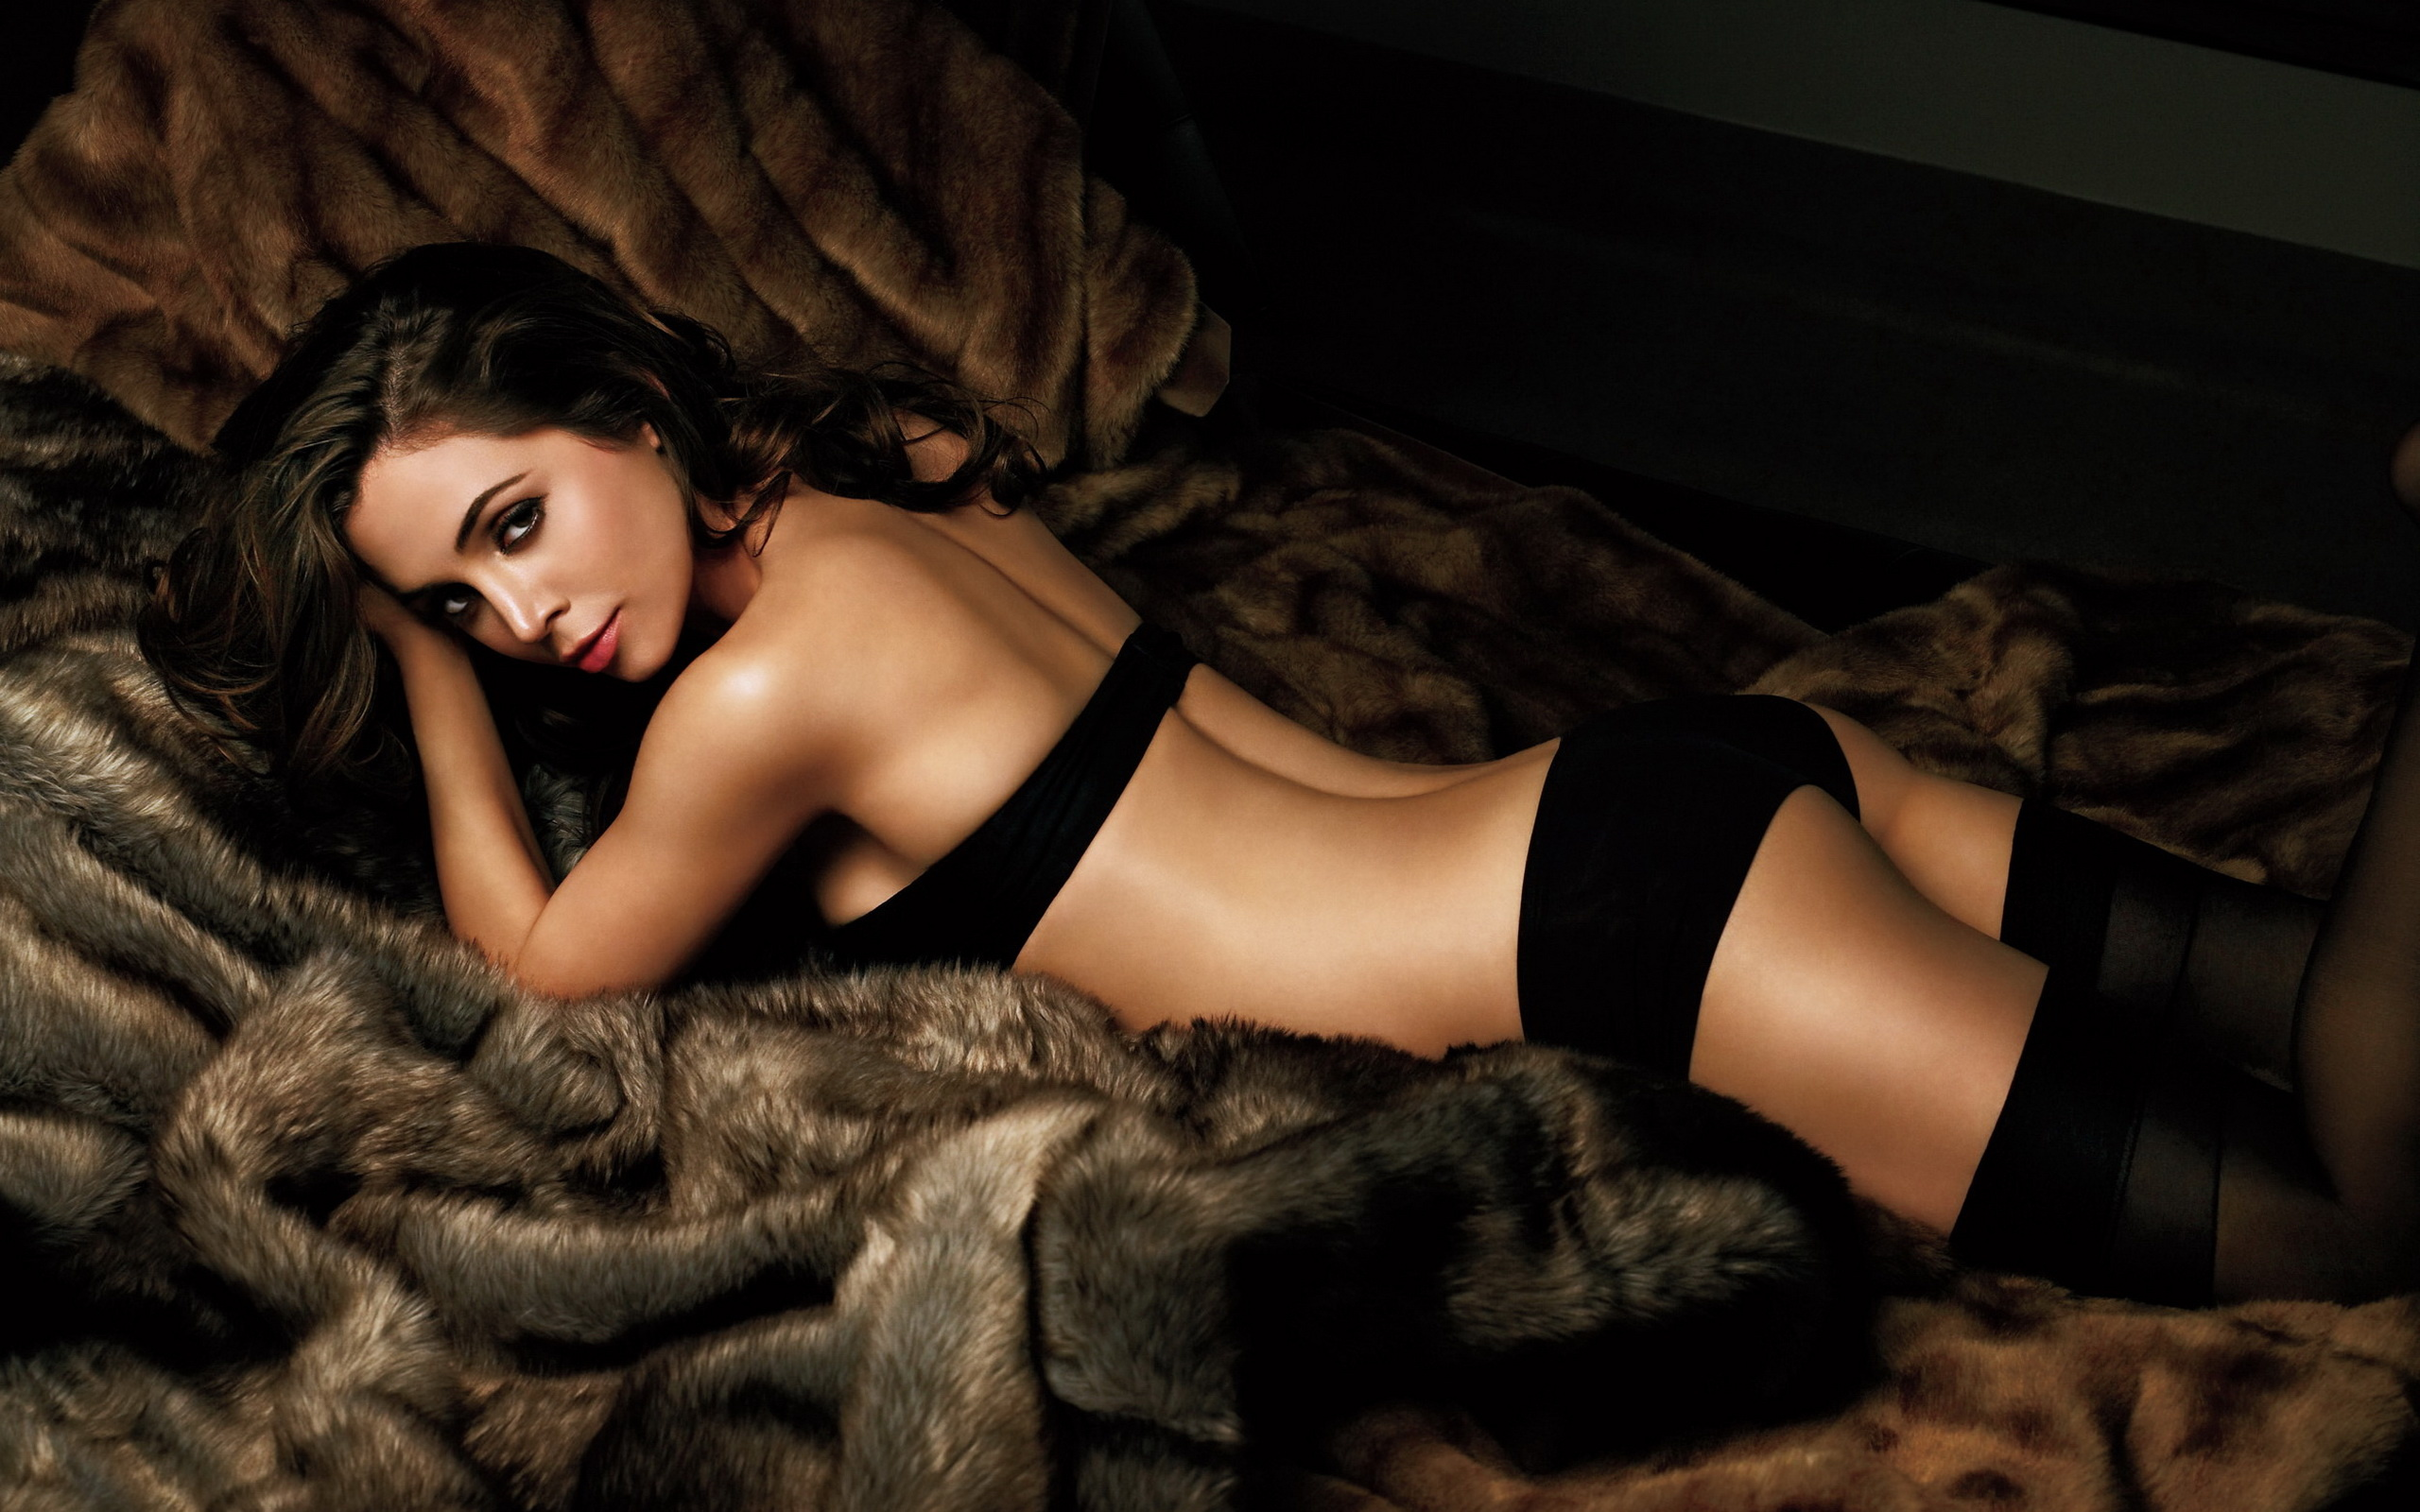 Download photo 1024x768, eliza dushku, actress, model ...